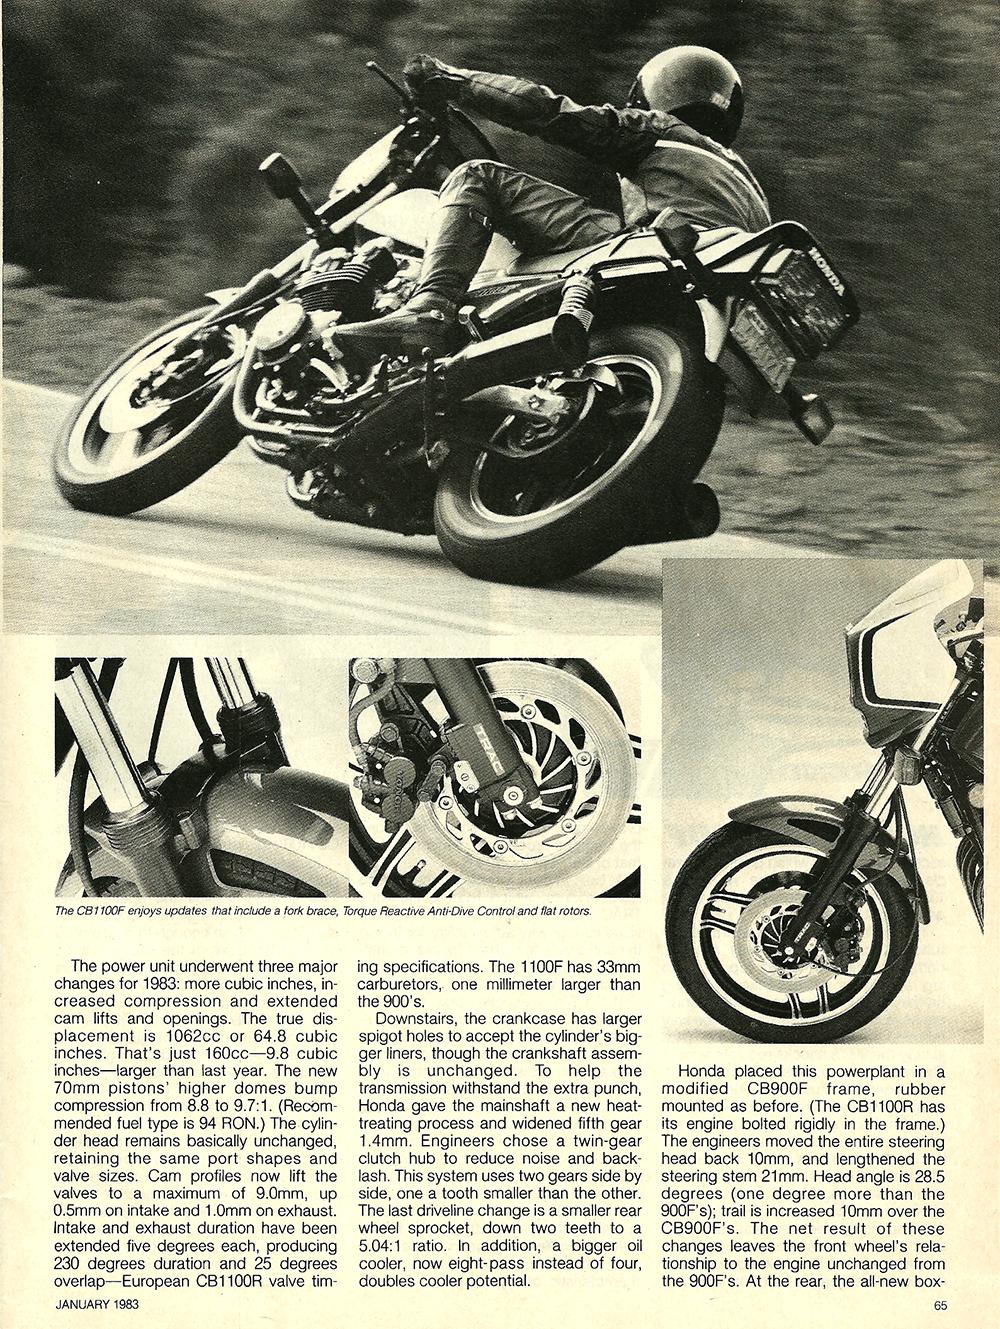 1983 Honda CB1100F road test 6.jpg